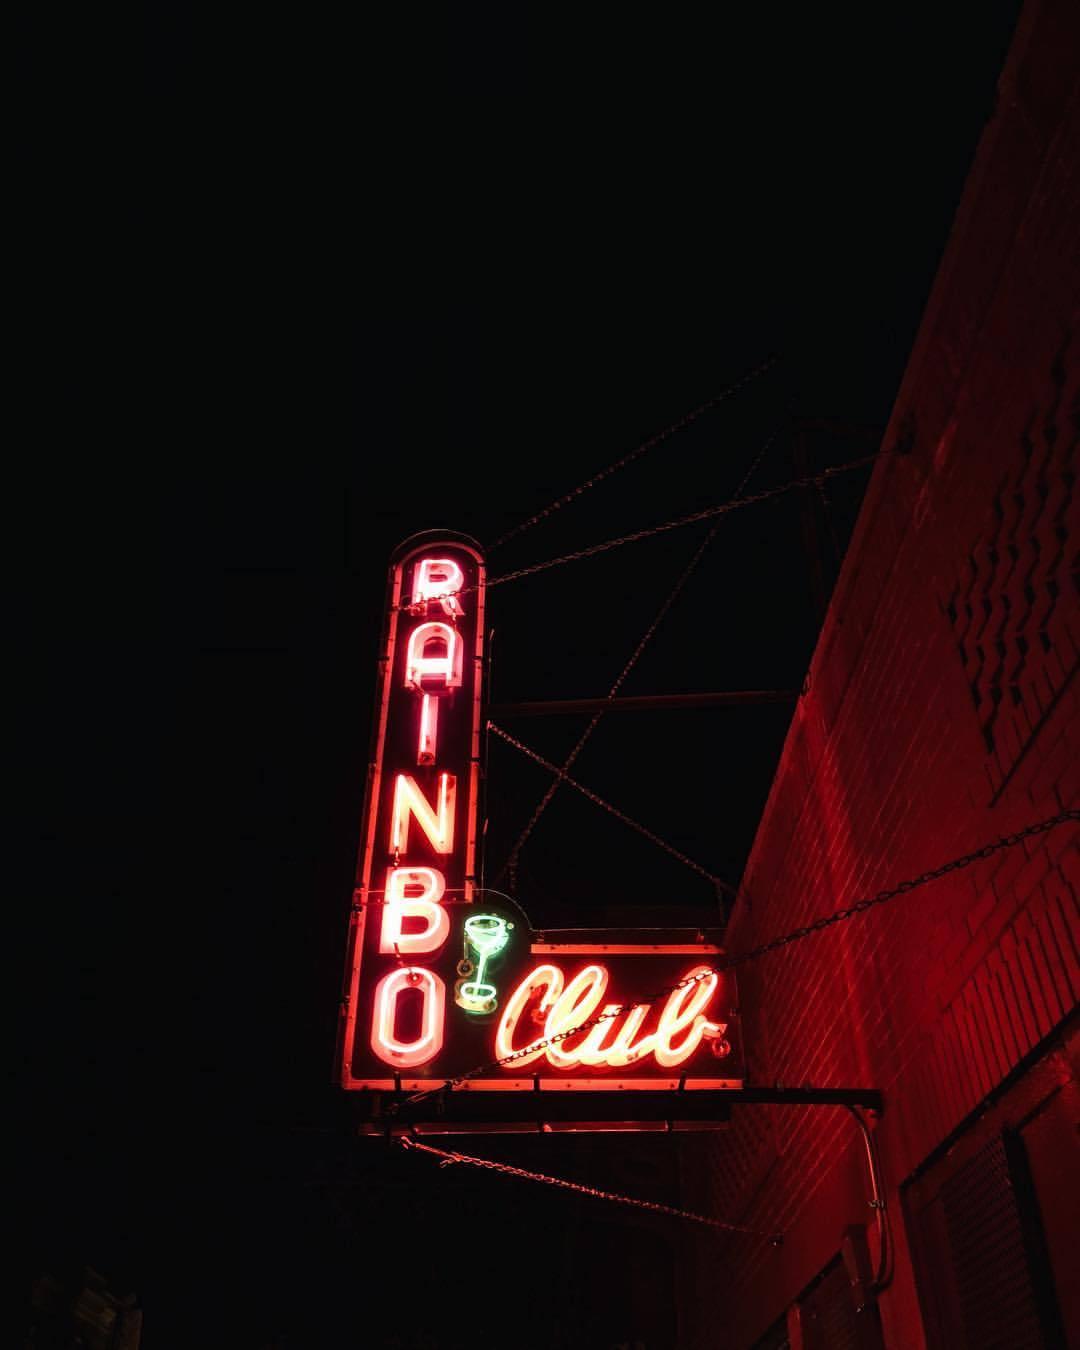 at Rainbo Club